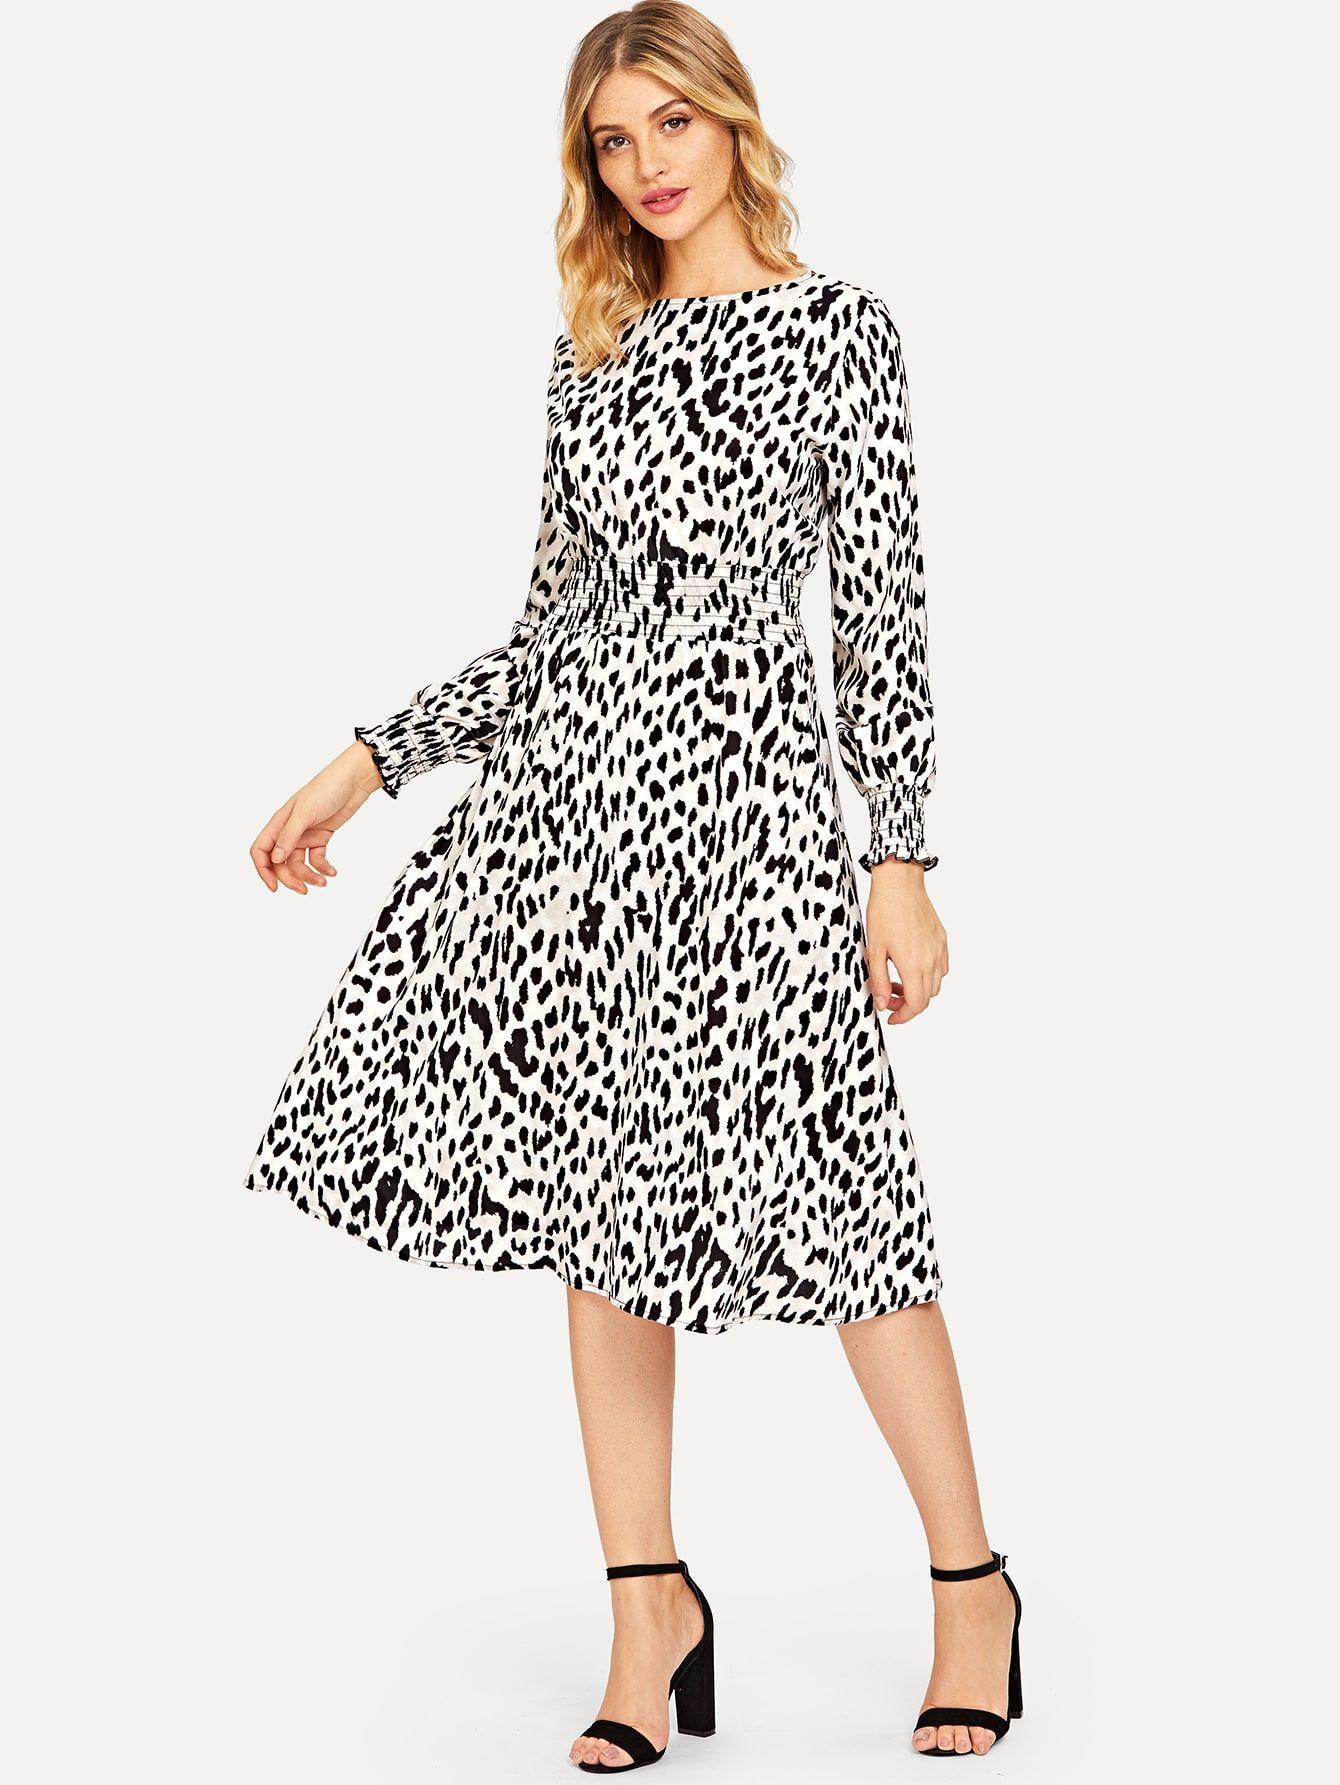 068425b79ca8 Leopard Print Shirred Waist Dress | SHEIN | Clothes in 2019 ...